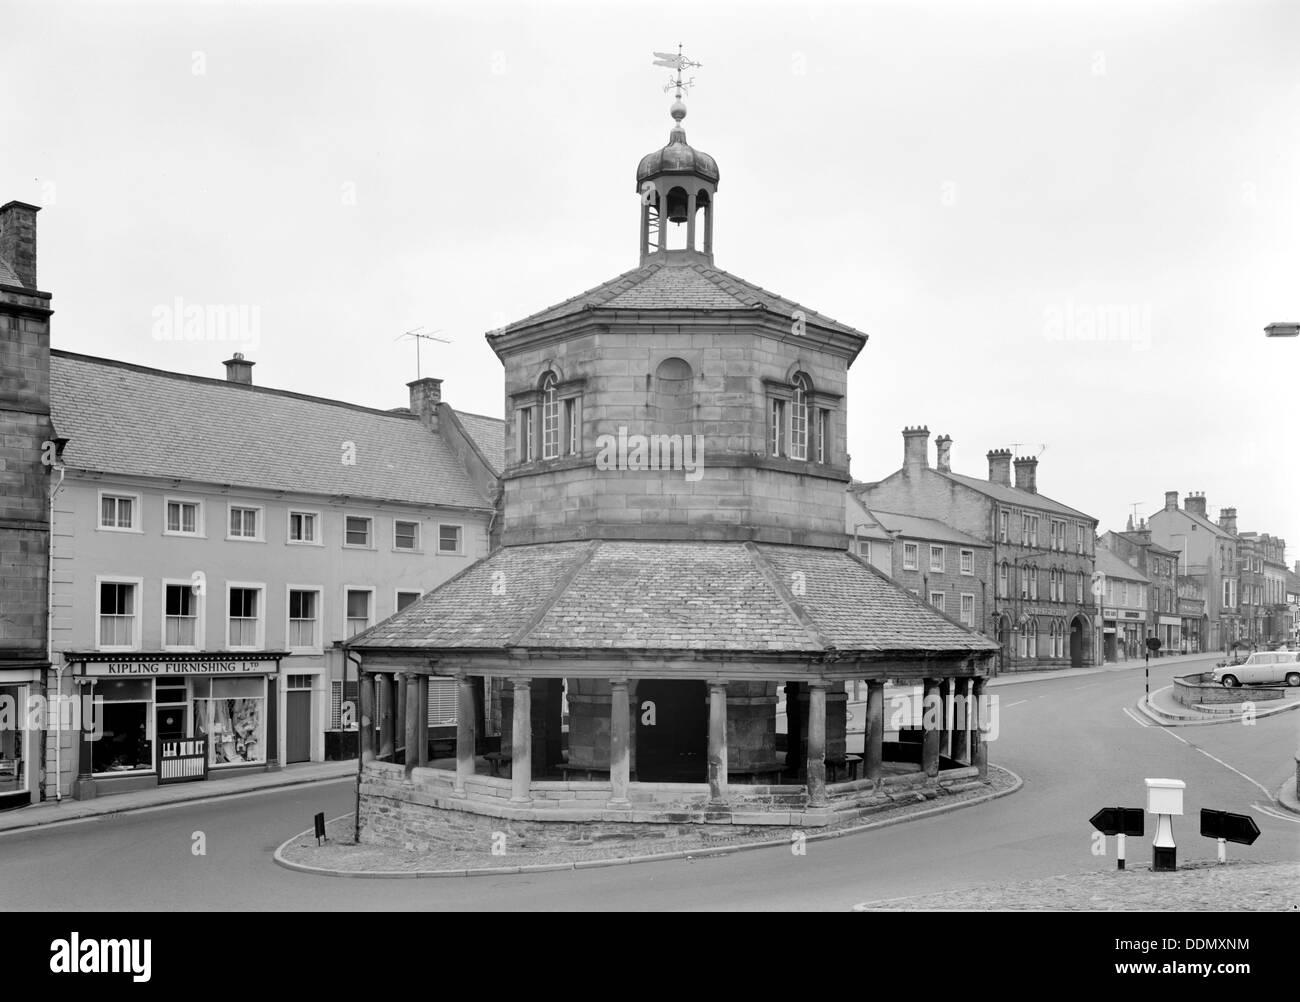 The Market Hall, Barnard Castle, Durham. - Stock Image